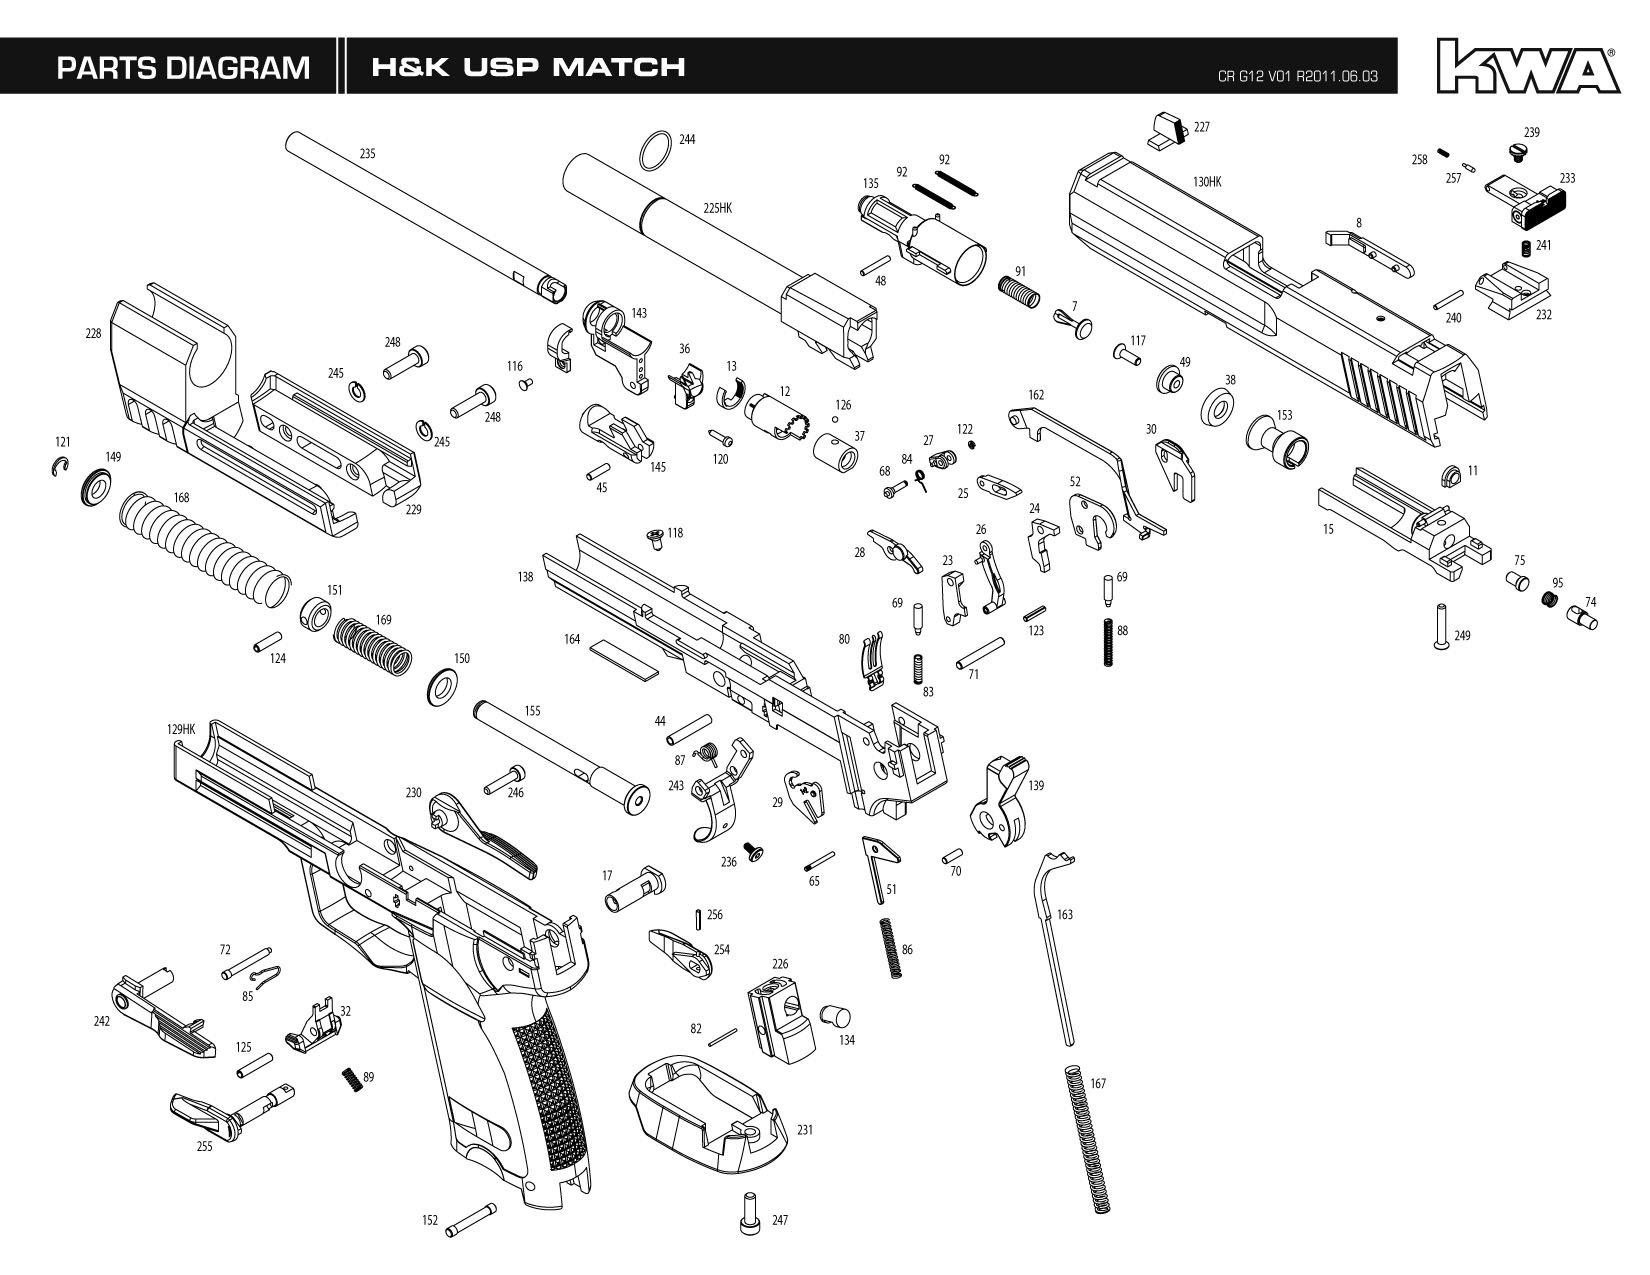 kwa gun manual h u0026k usp match